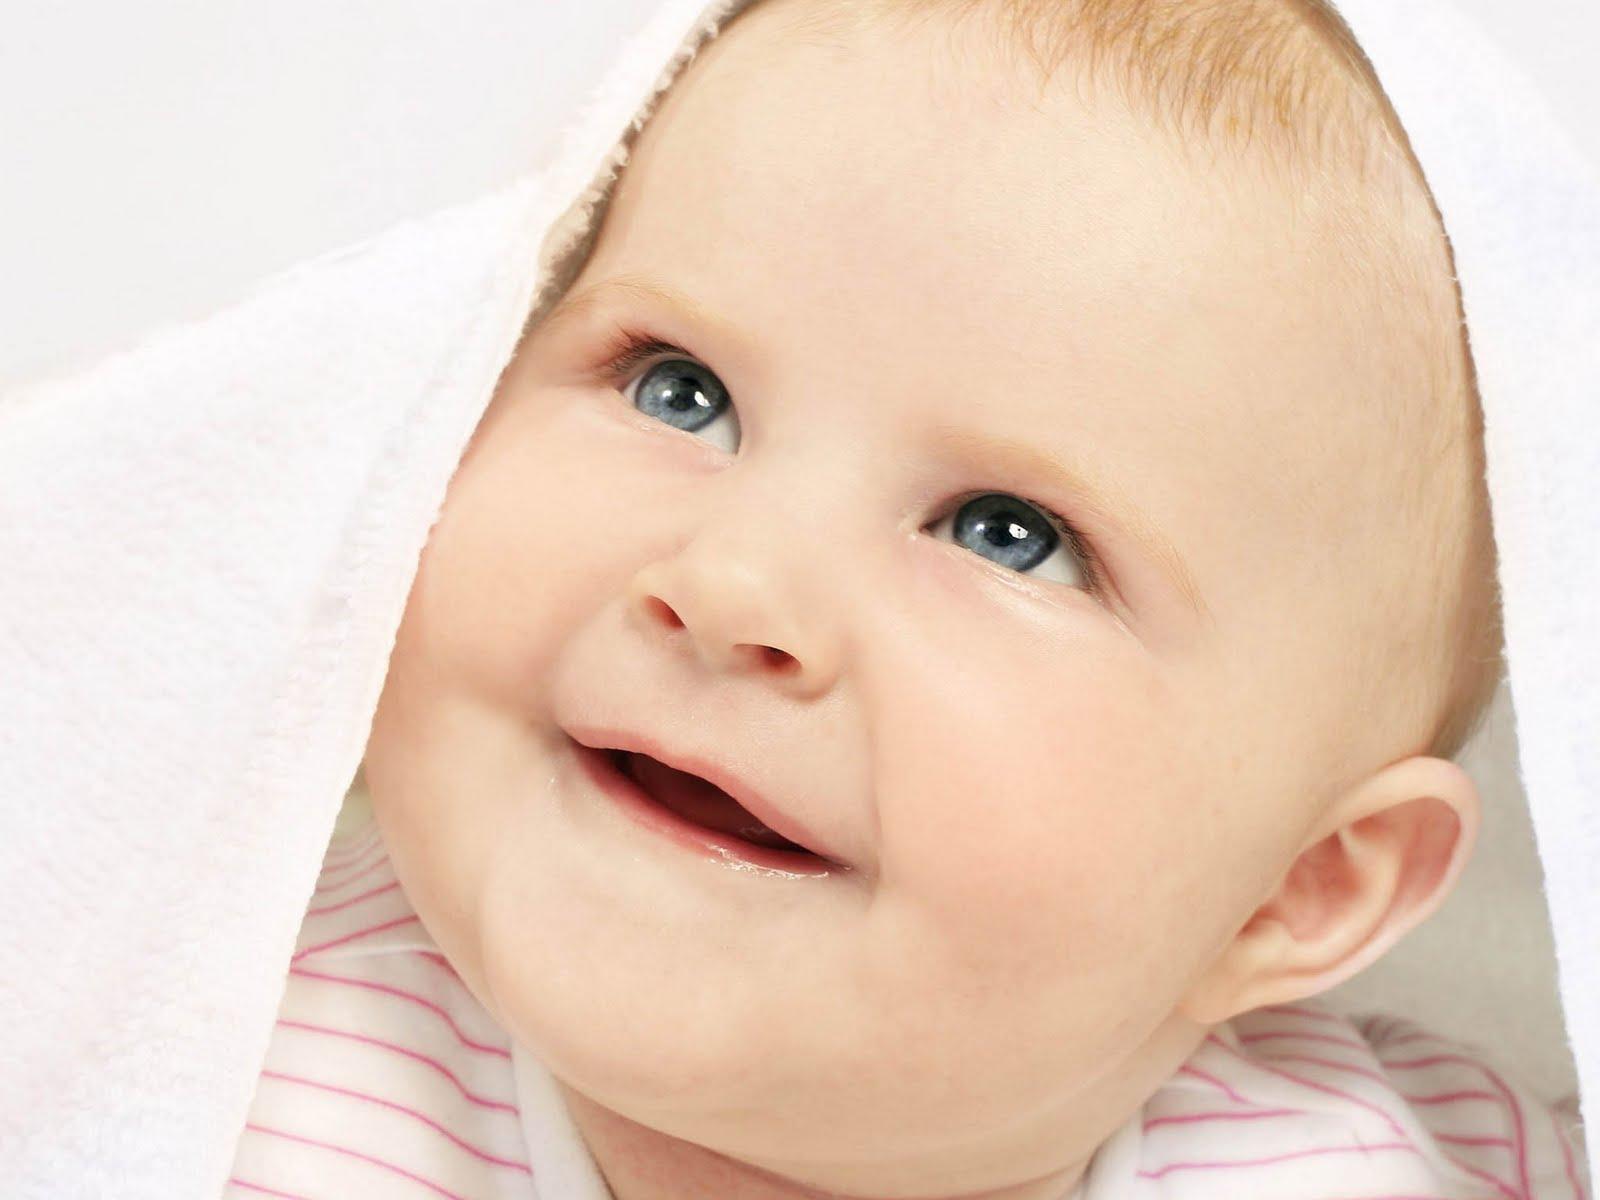 Funny Baby Wallpaper 1 Widescreen Wallpaper